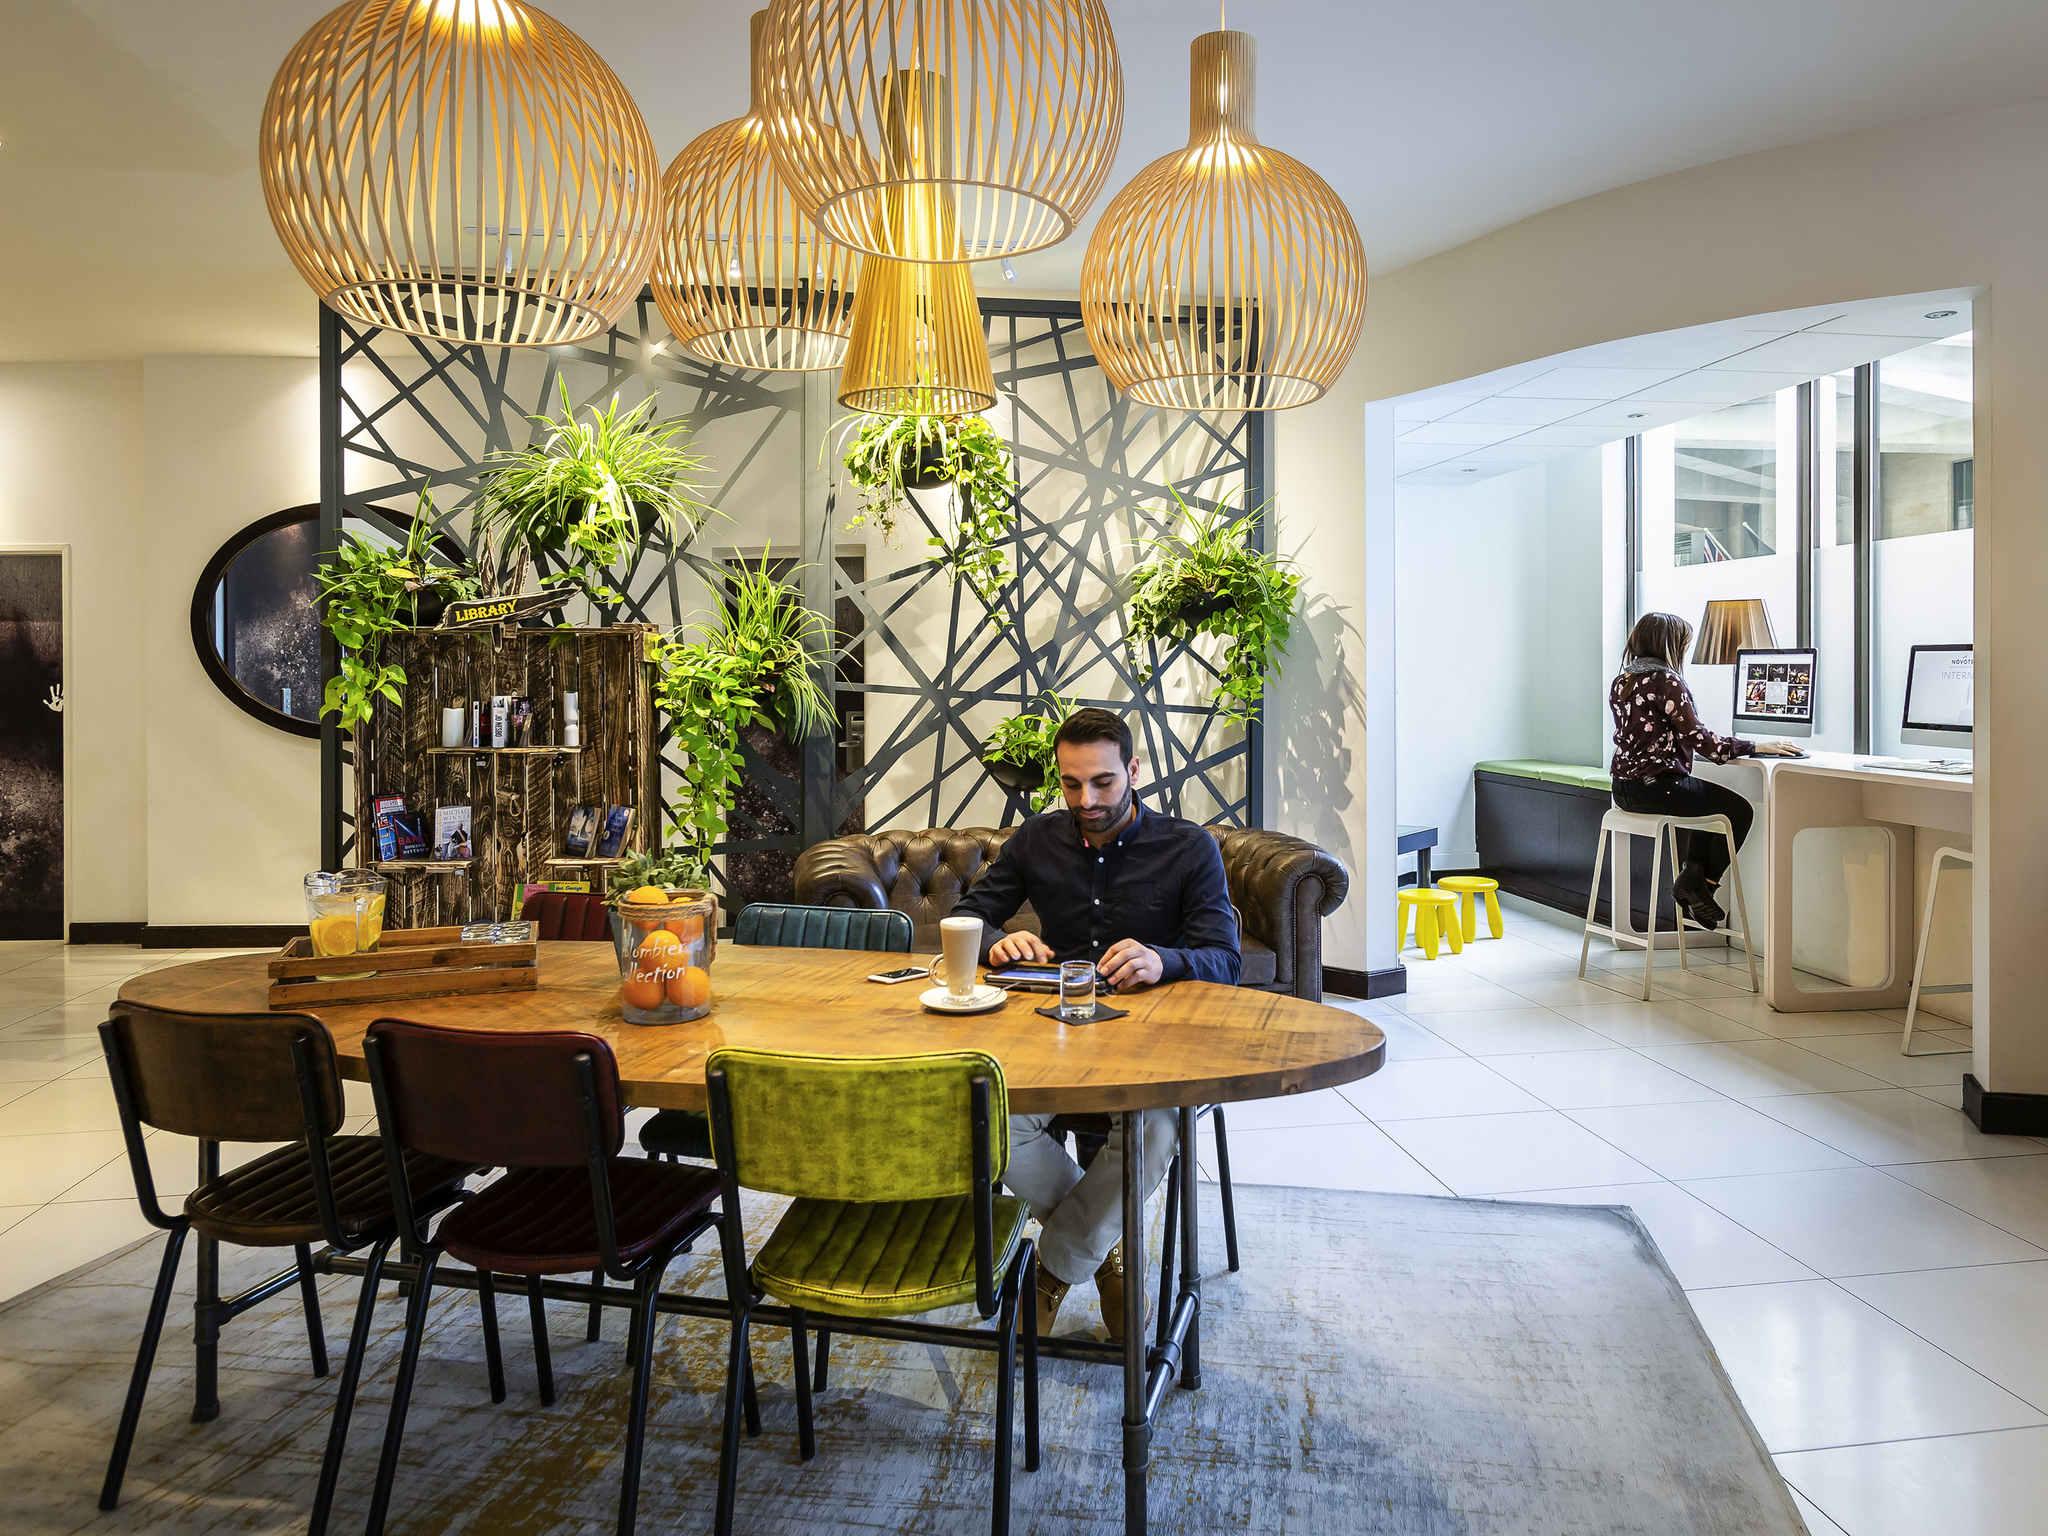 فندق - نوفوتيل Novotel لندن تاور بريدج